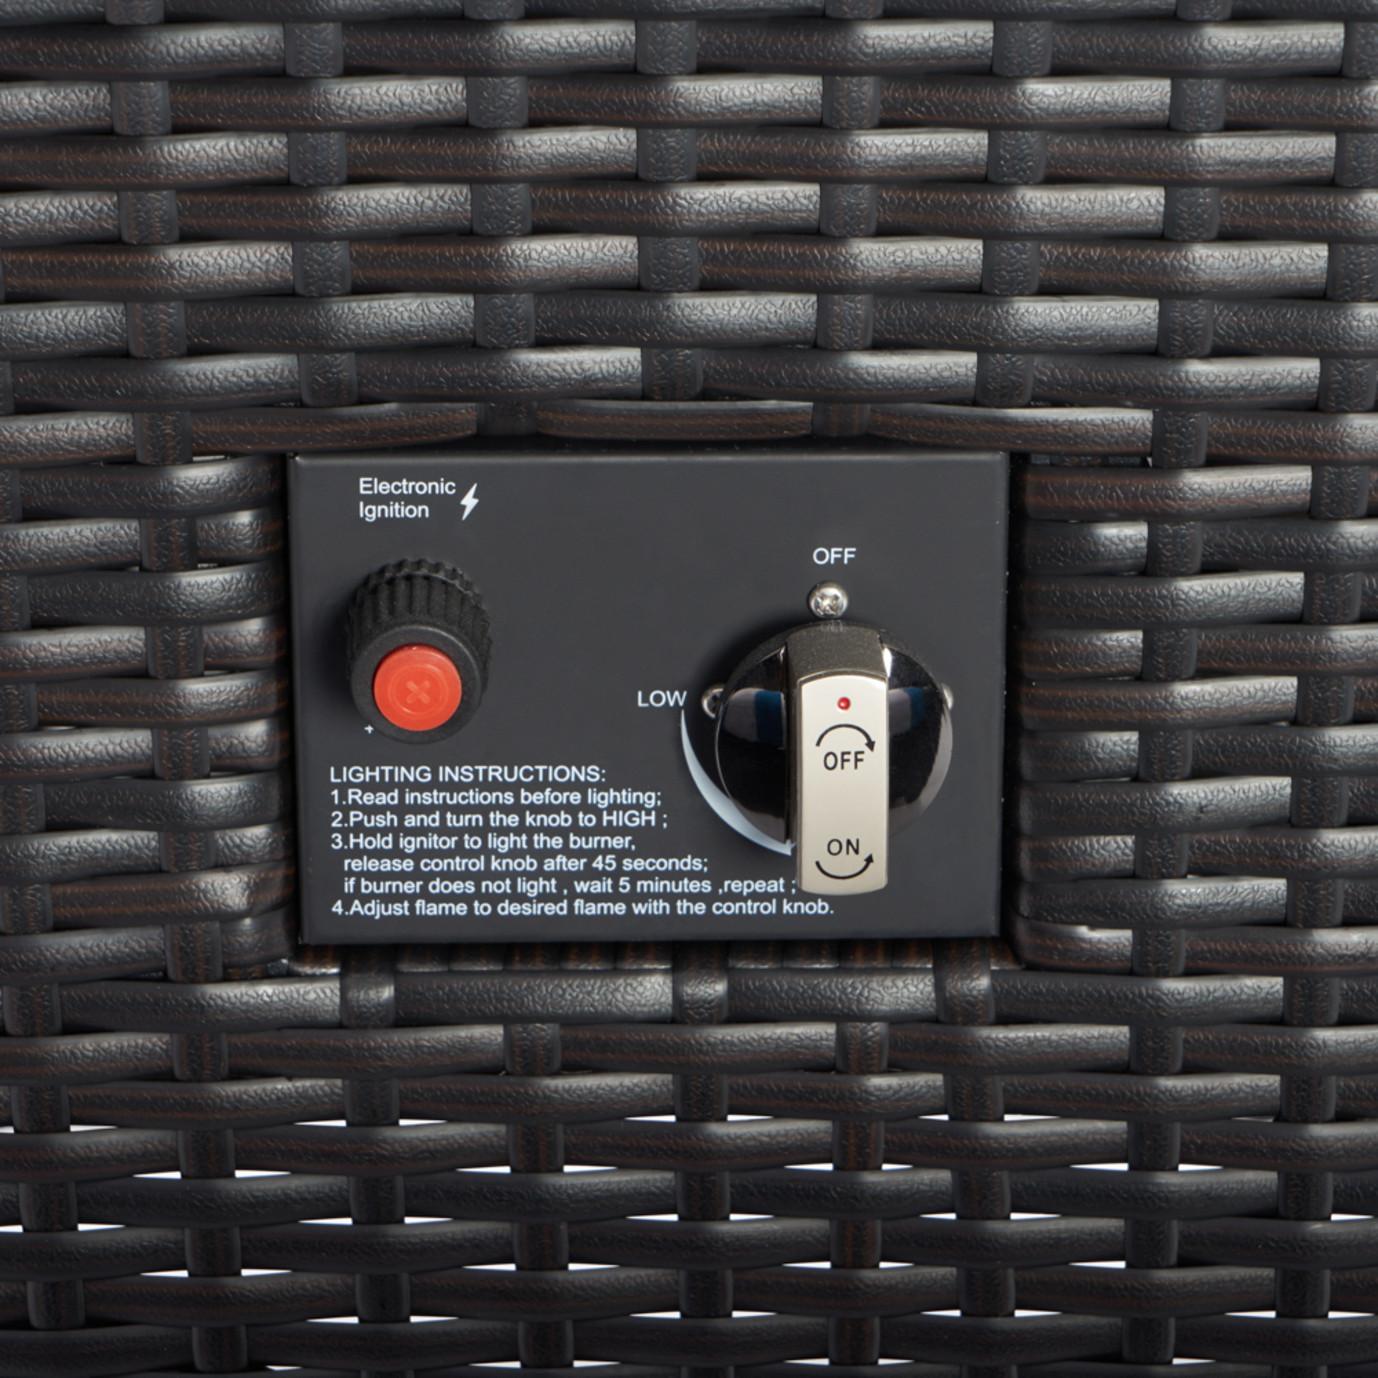 Deco™ 5pc Love & Motion Club Fire Set - Charcoal Gray